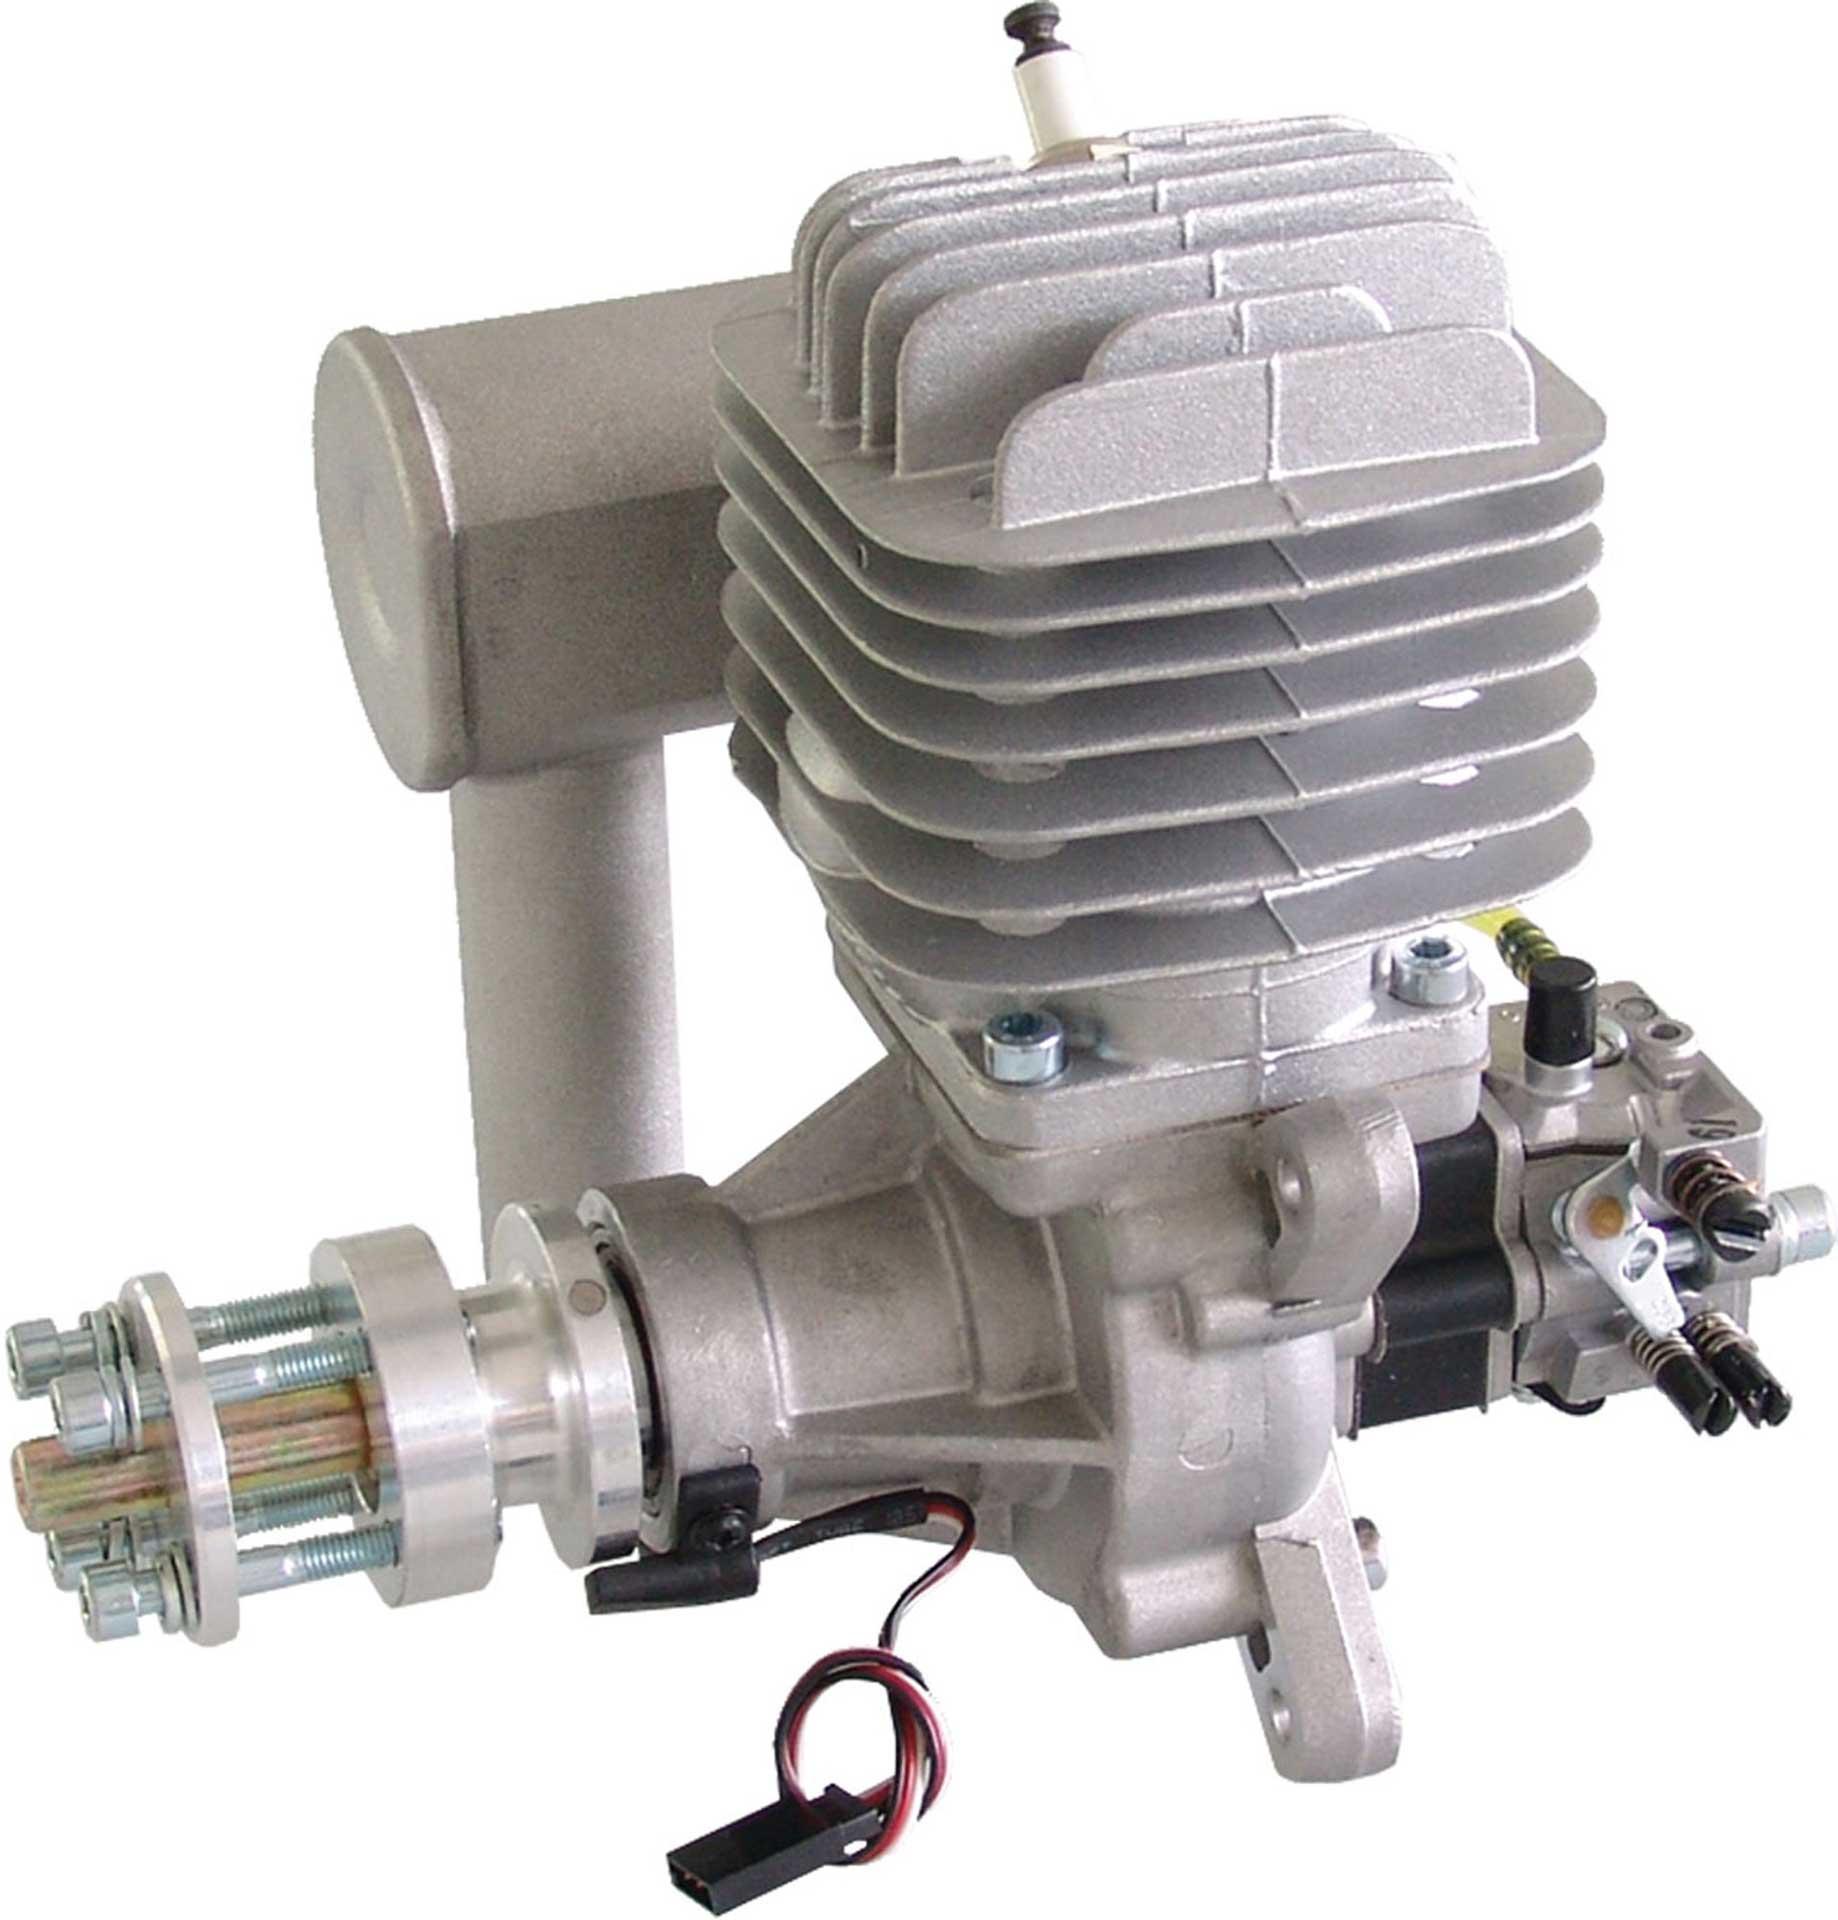 DLE Engines DLE 55 BENZIN MOTOR SEITENAUSLASS